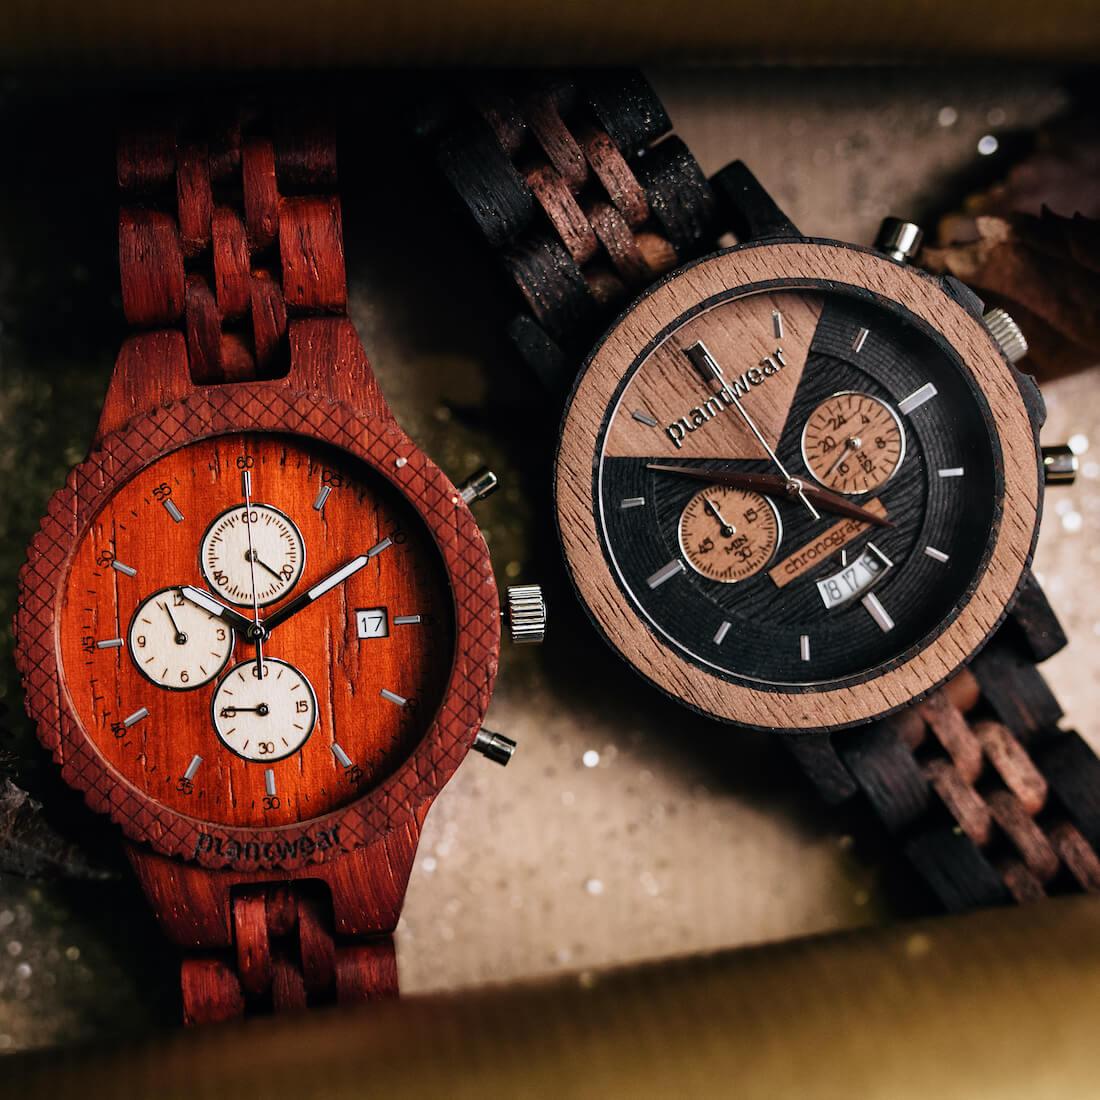 plantwear_pl_aranzacyjne_drewniane_zegarki_fox_padouk_select_chronograph_duo_01 (1)